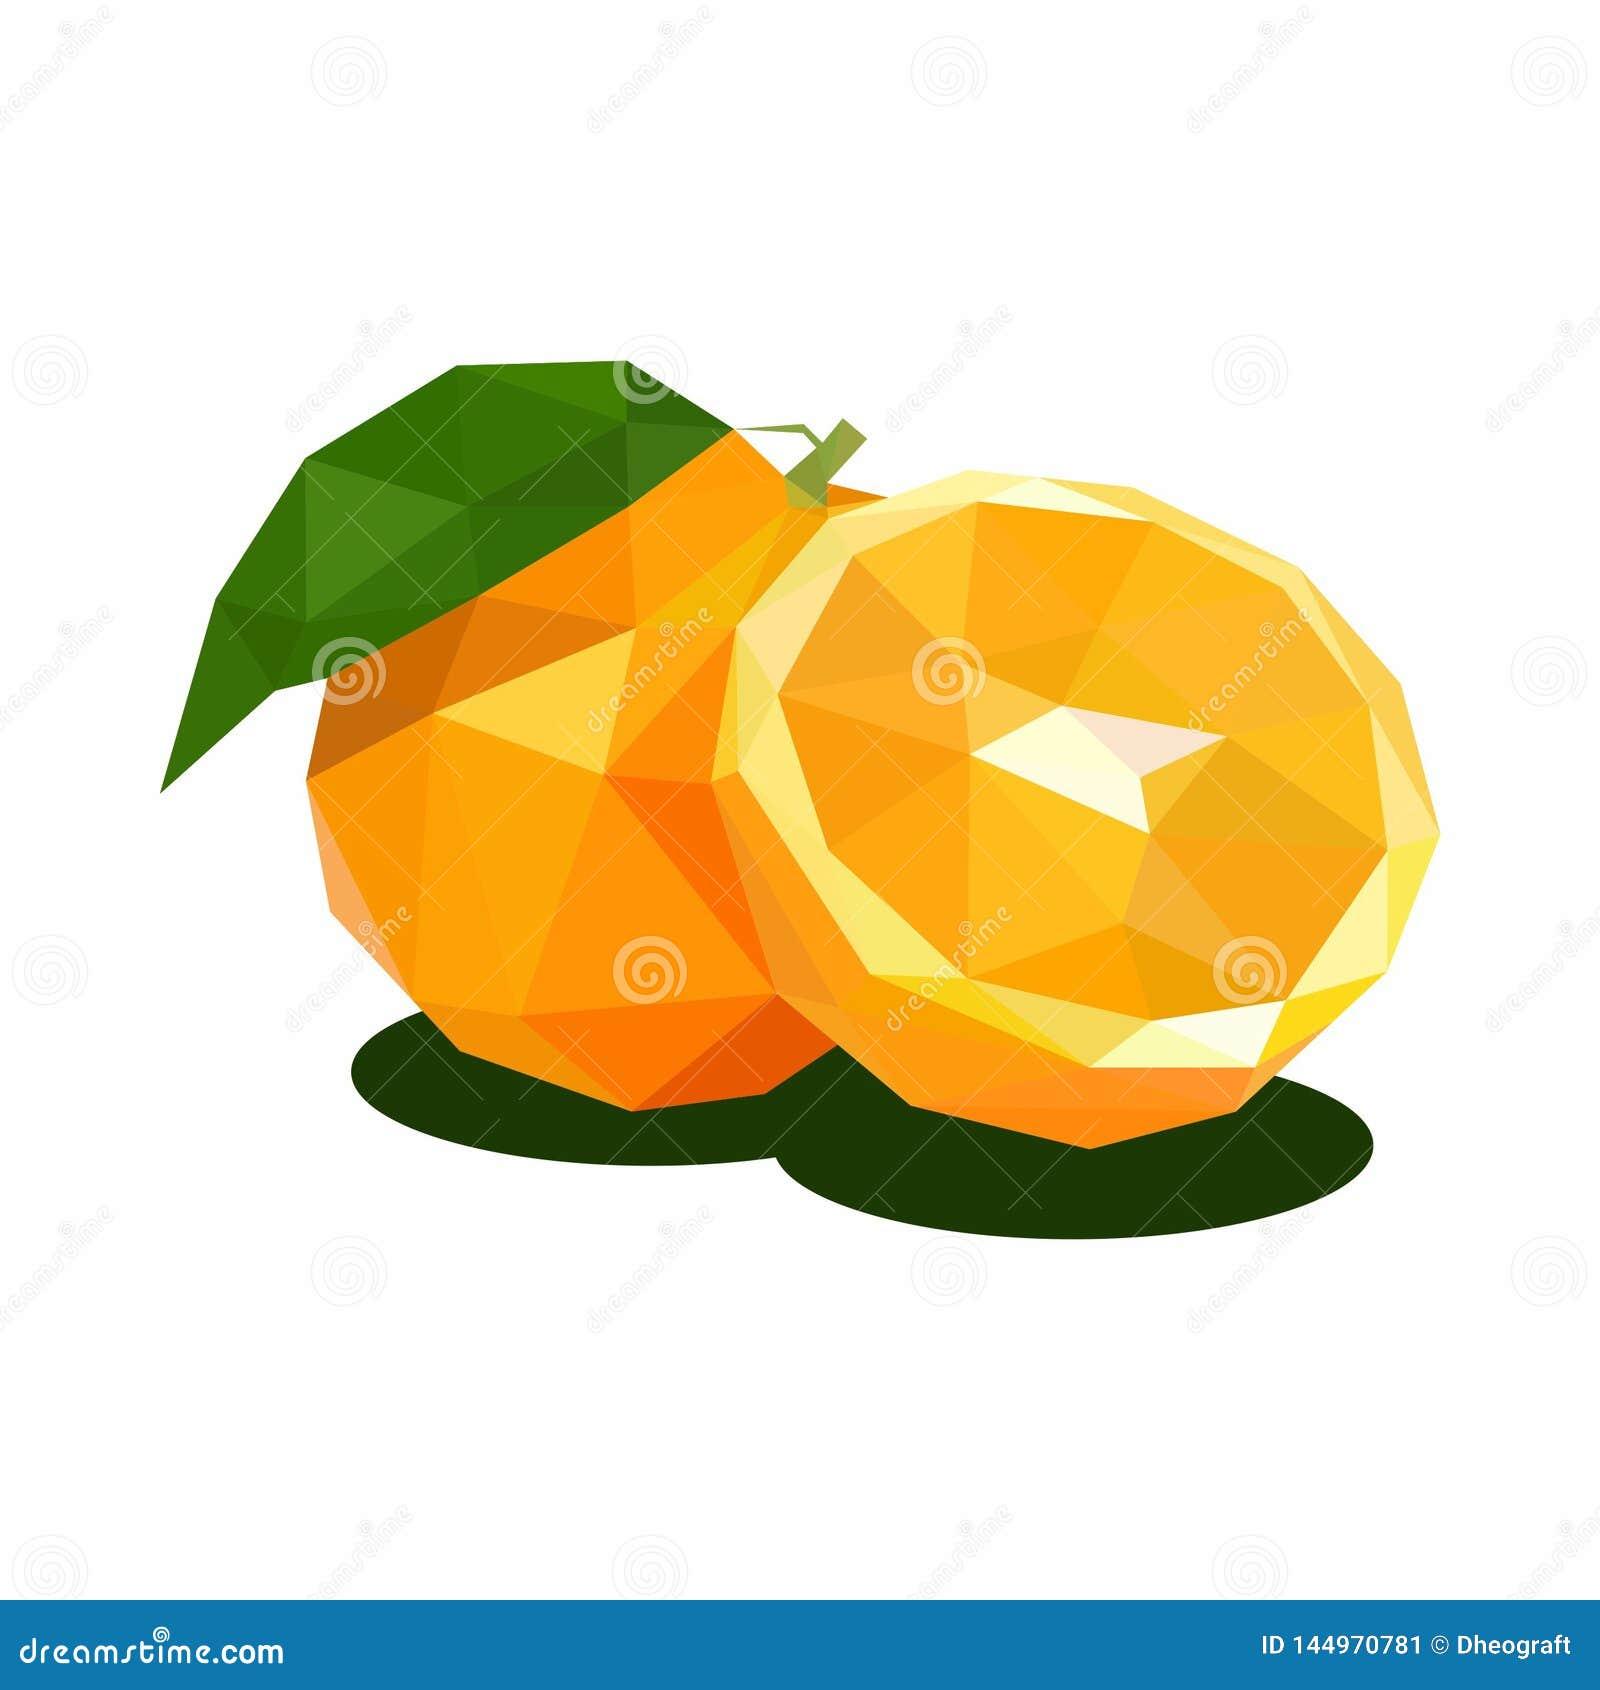 Orange, Illustration of Fruit. Polygonal Art